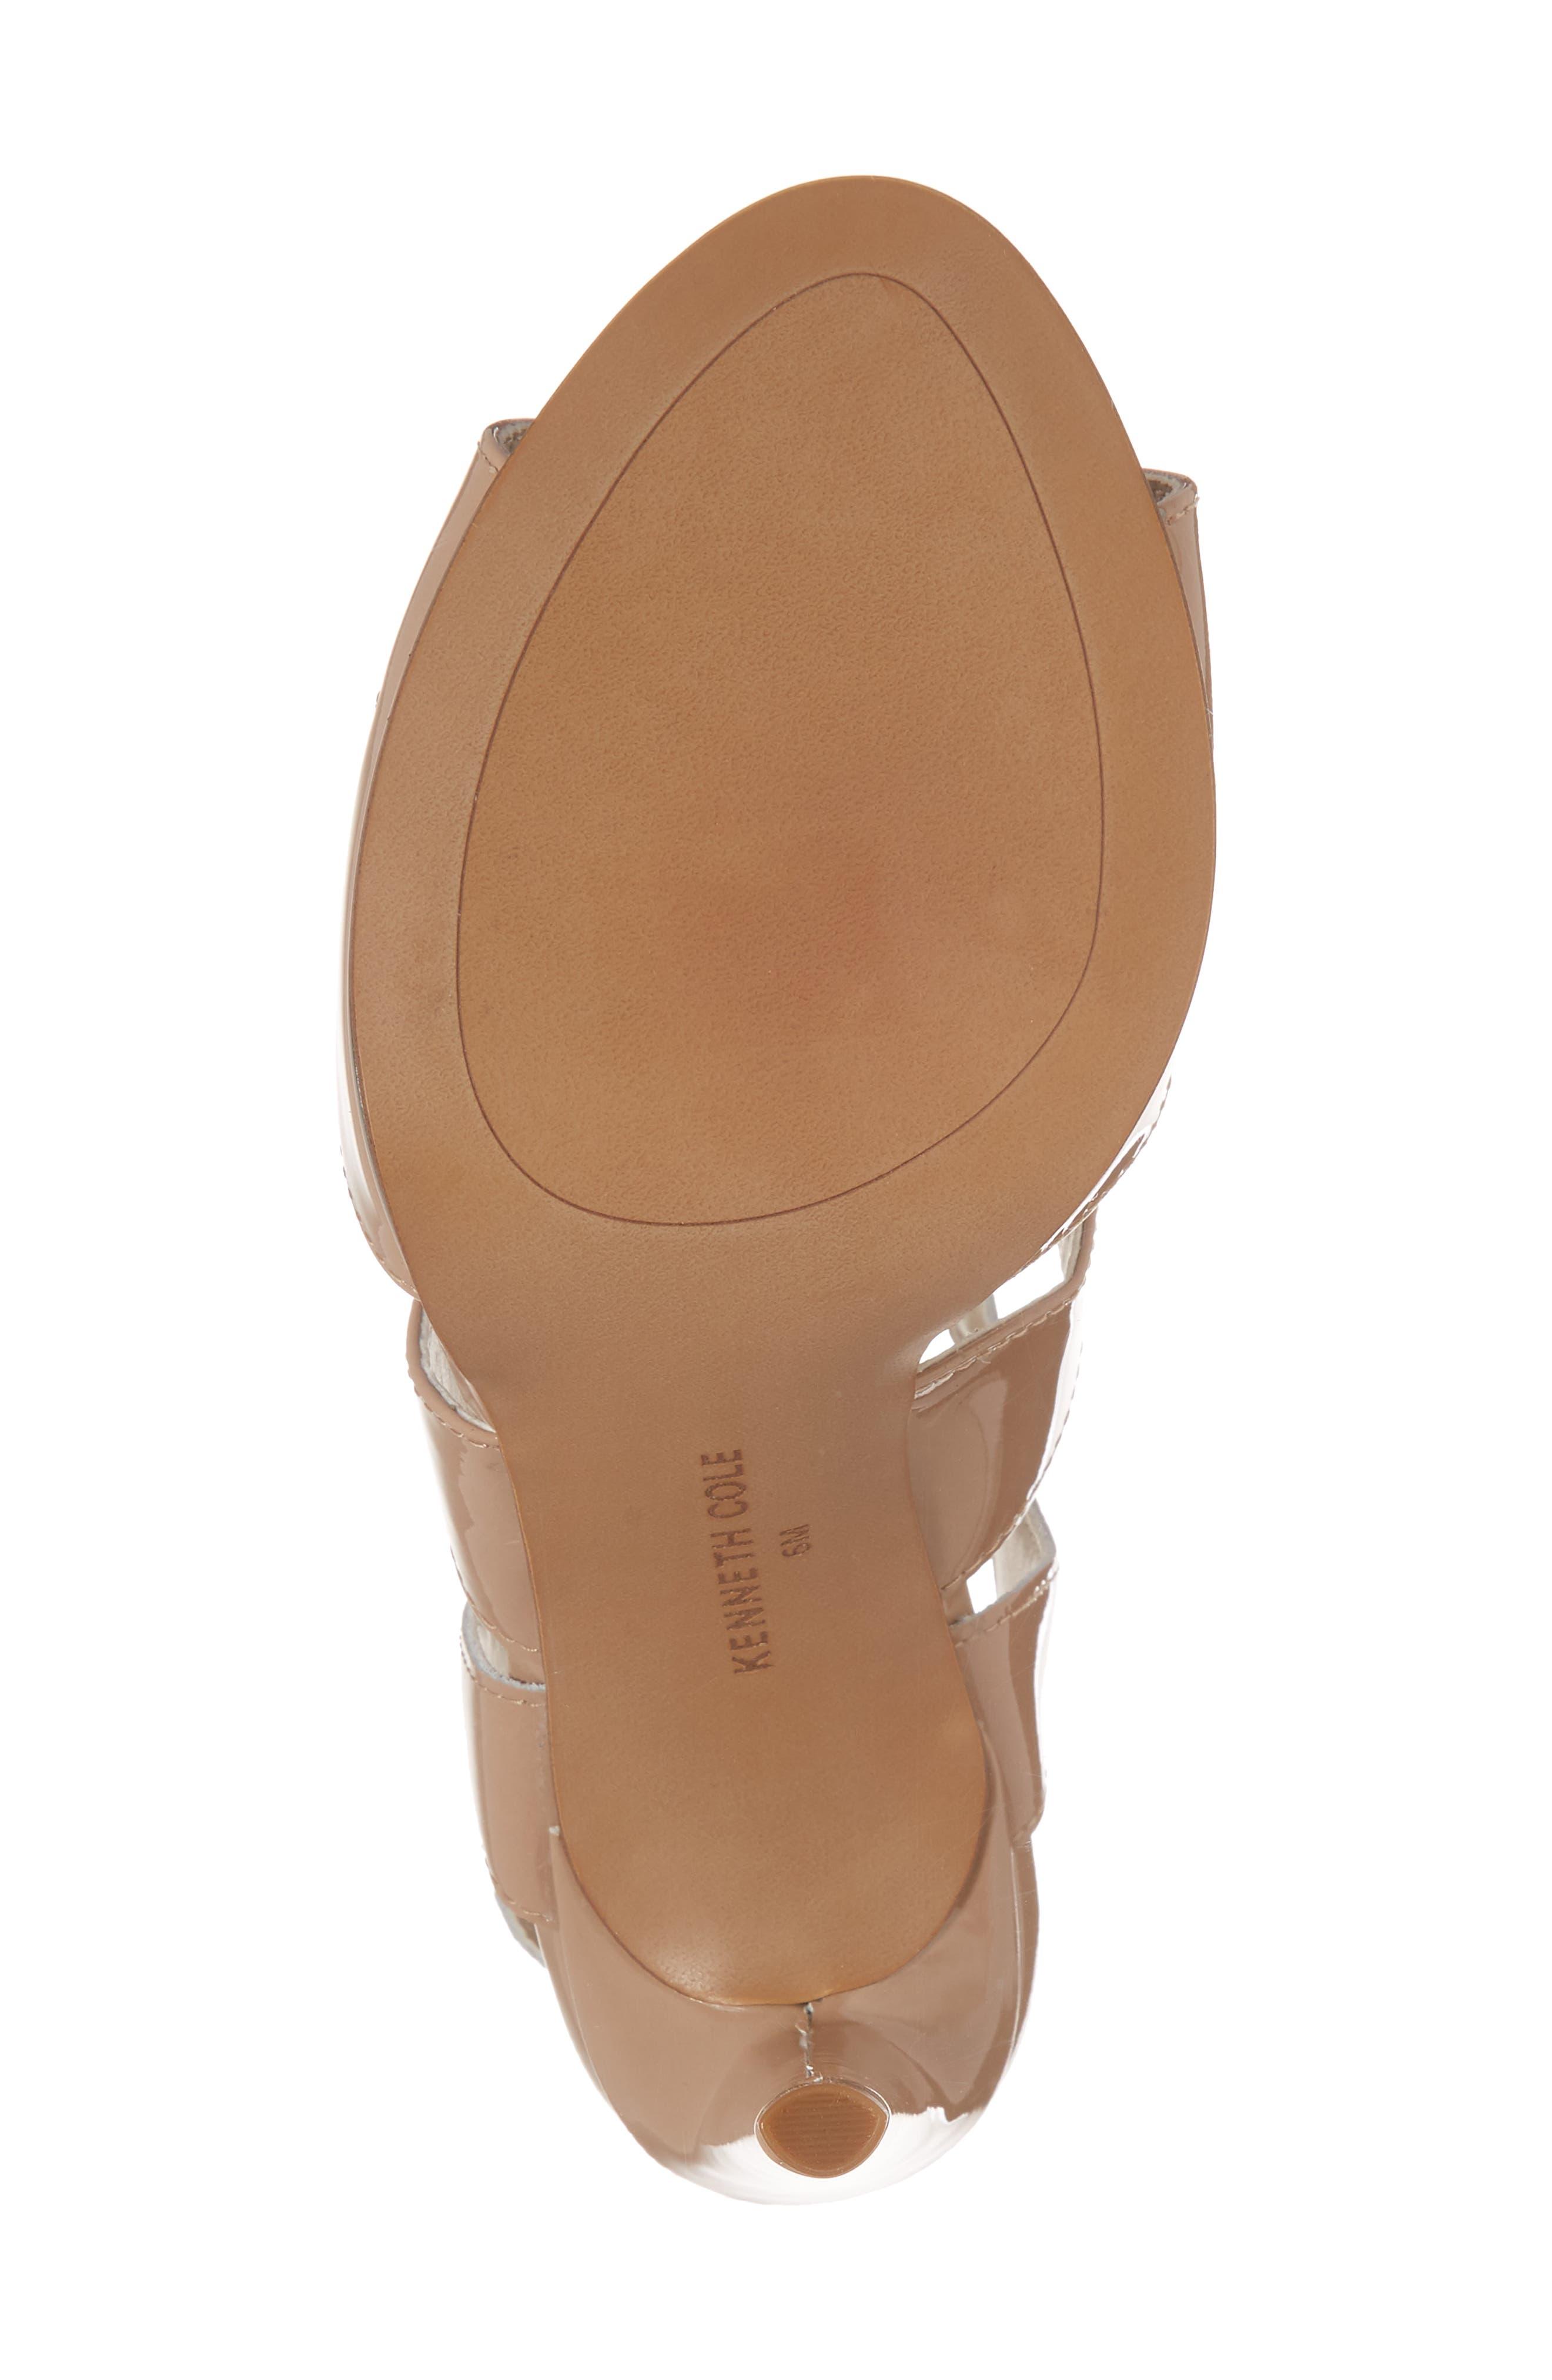 Baldwin Sandal,                             Alternate thumbnail 6, color,                             Nude Patent Leather